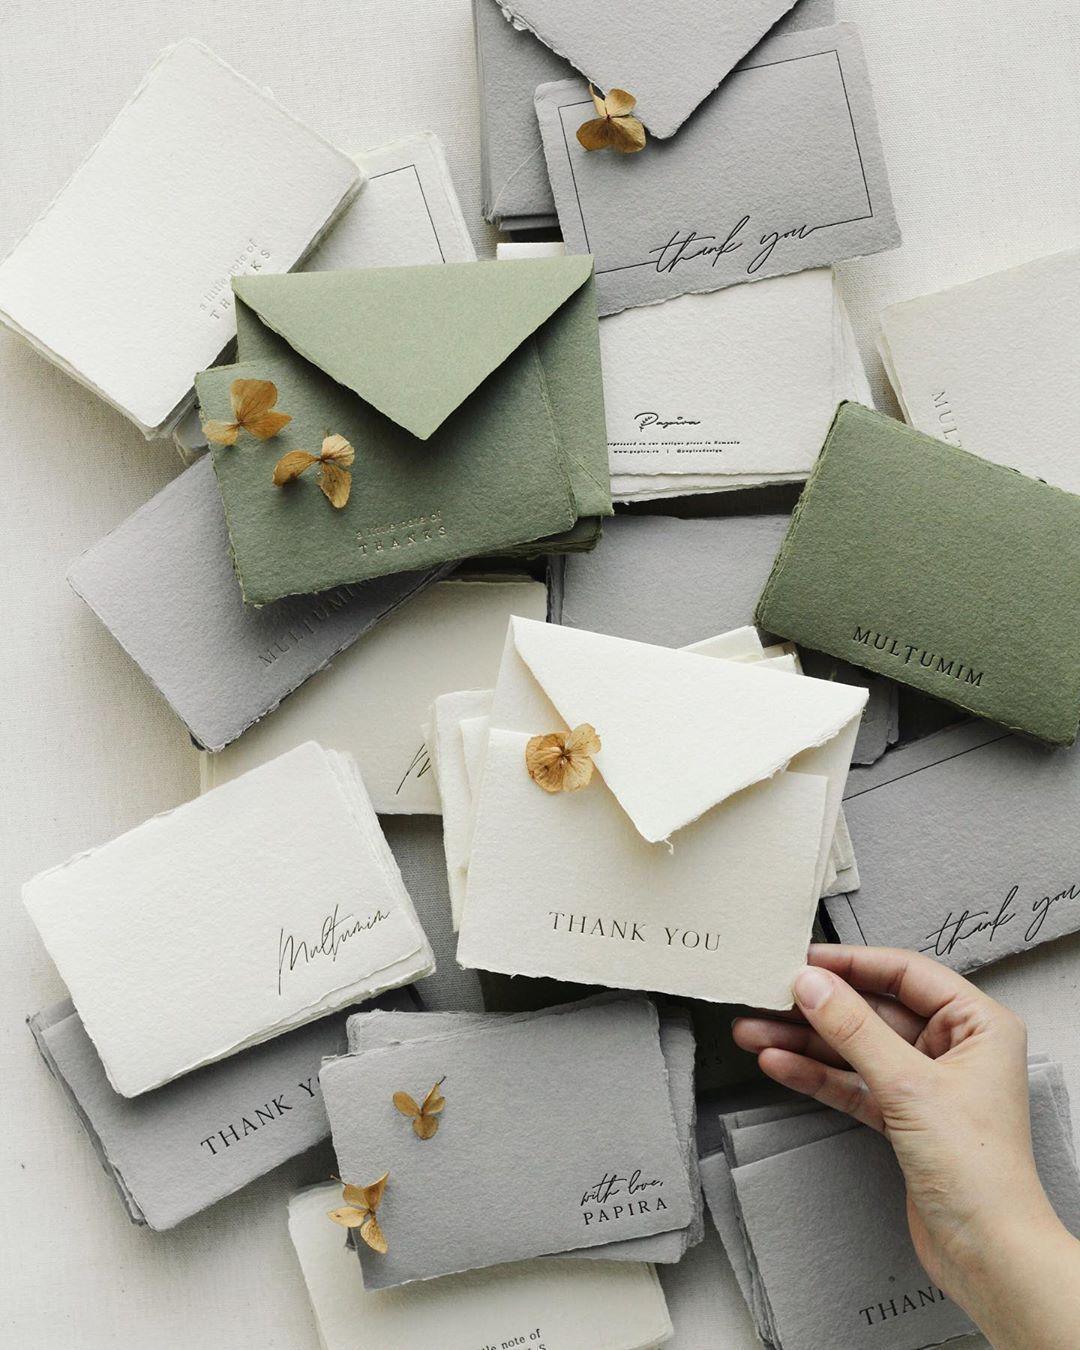 Top 40 Wedding Invitations On Etsy In 2020 Wedding Invitations Wedding Invitation Kits Sage Wedding Invite